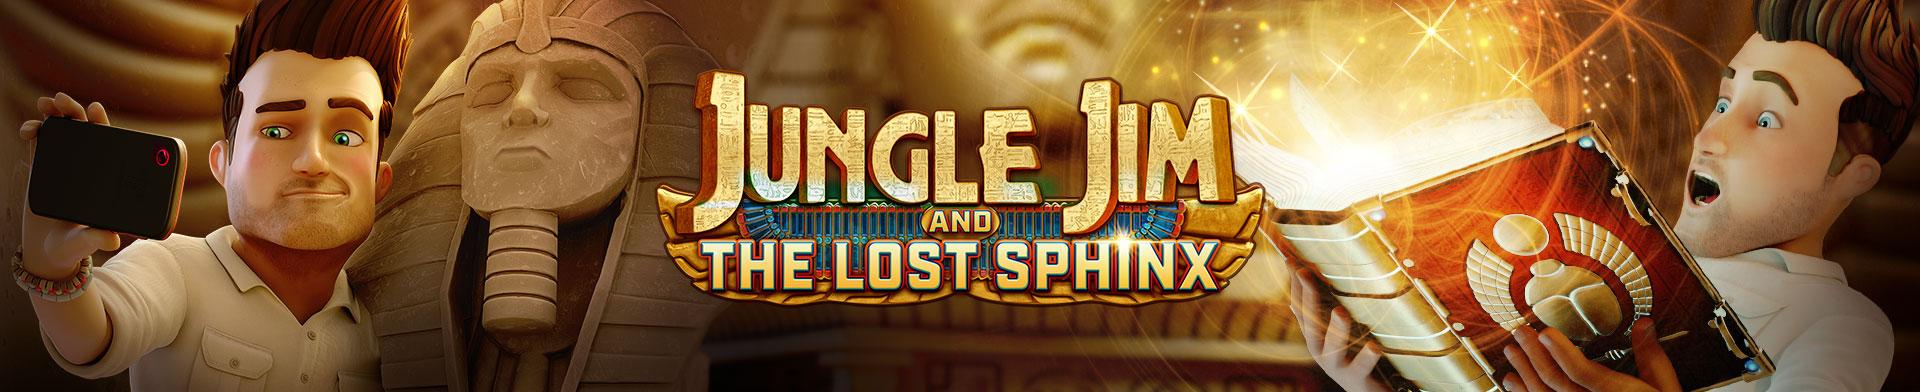 Jungle Jim The Lost Sphinx Banner